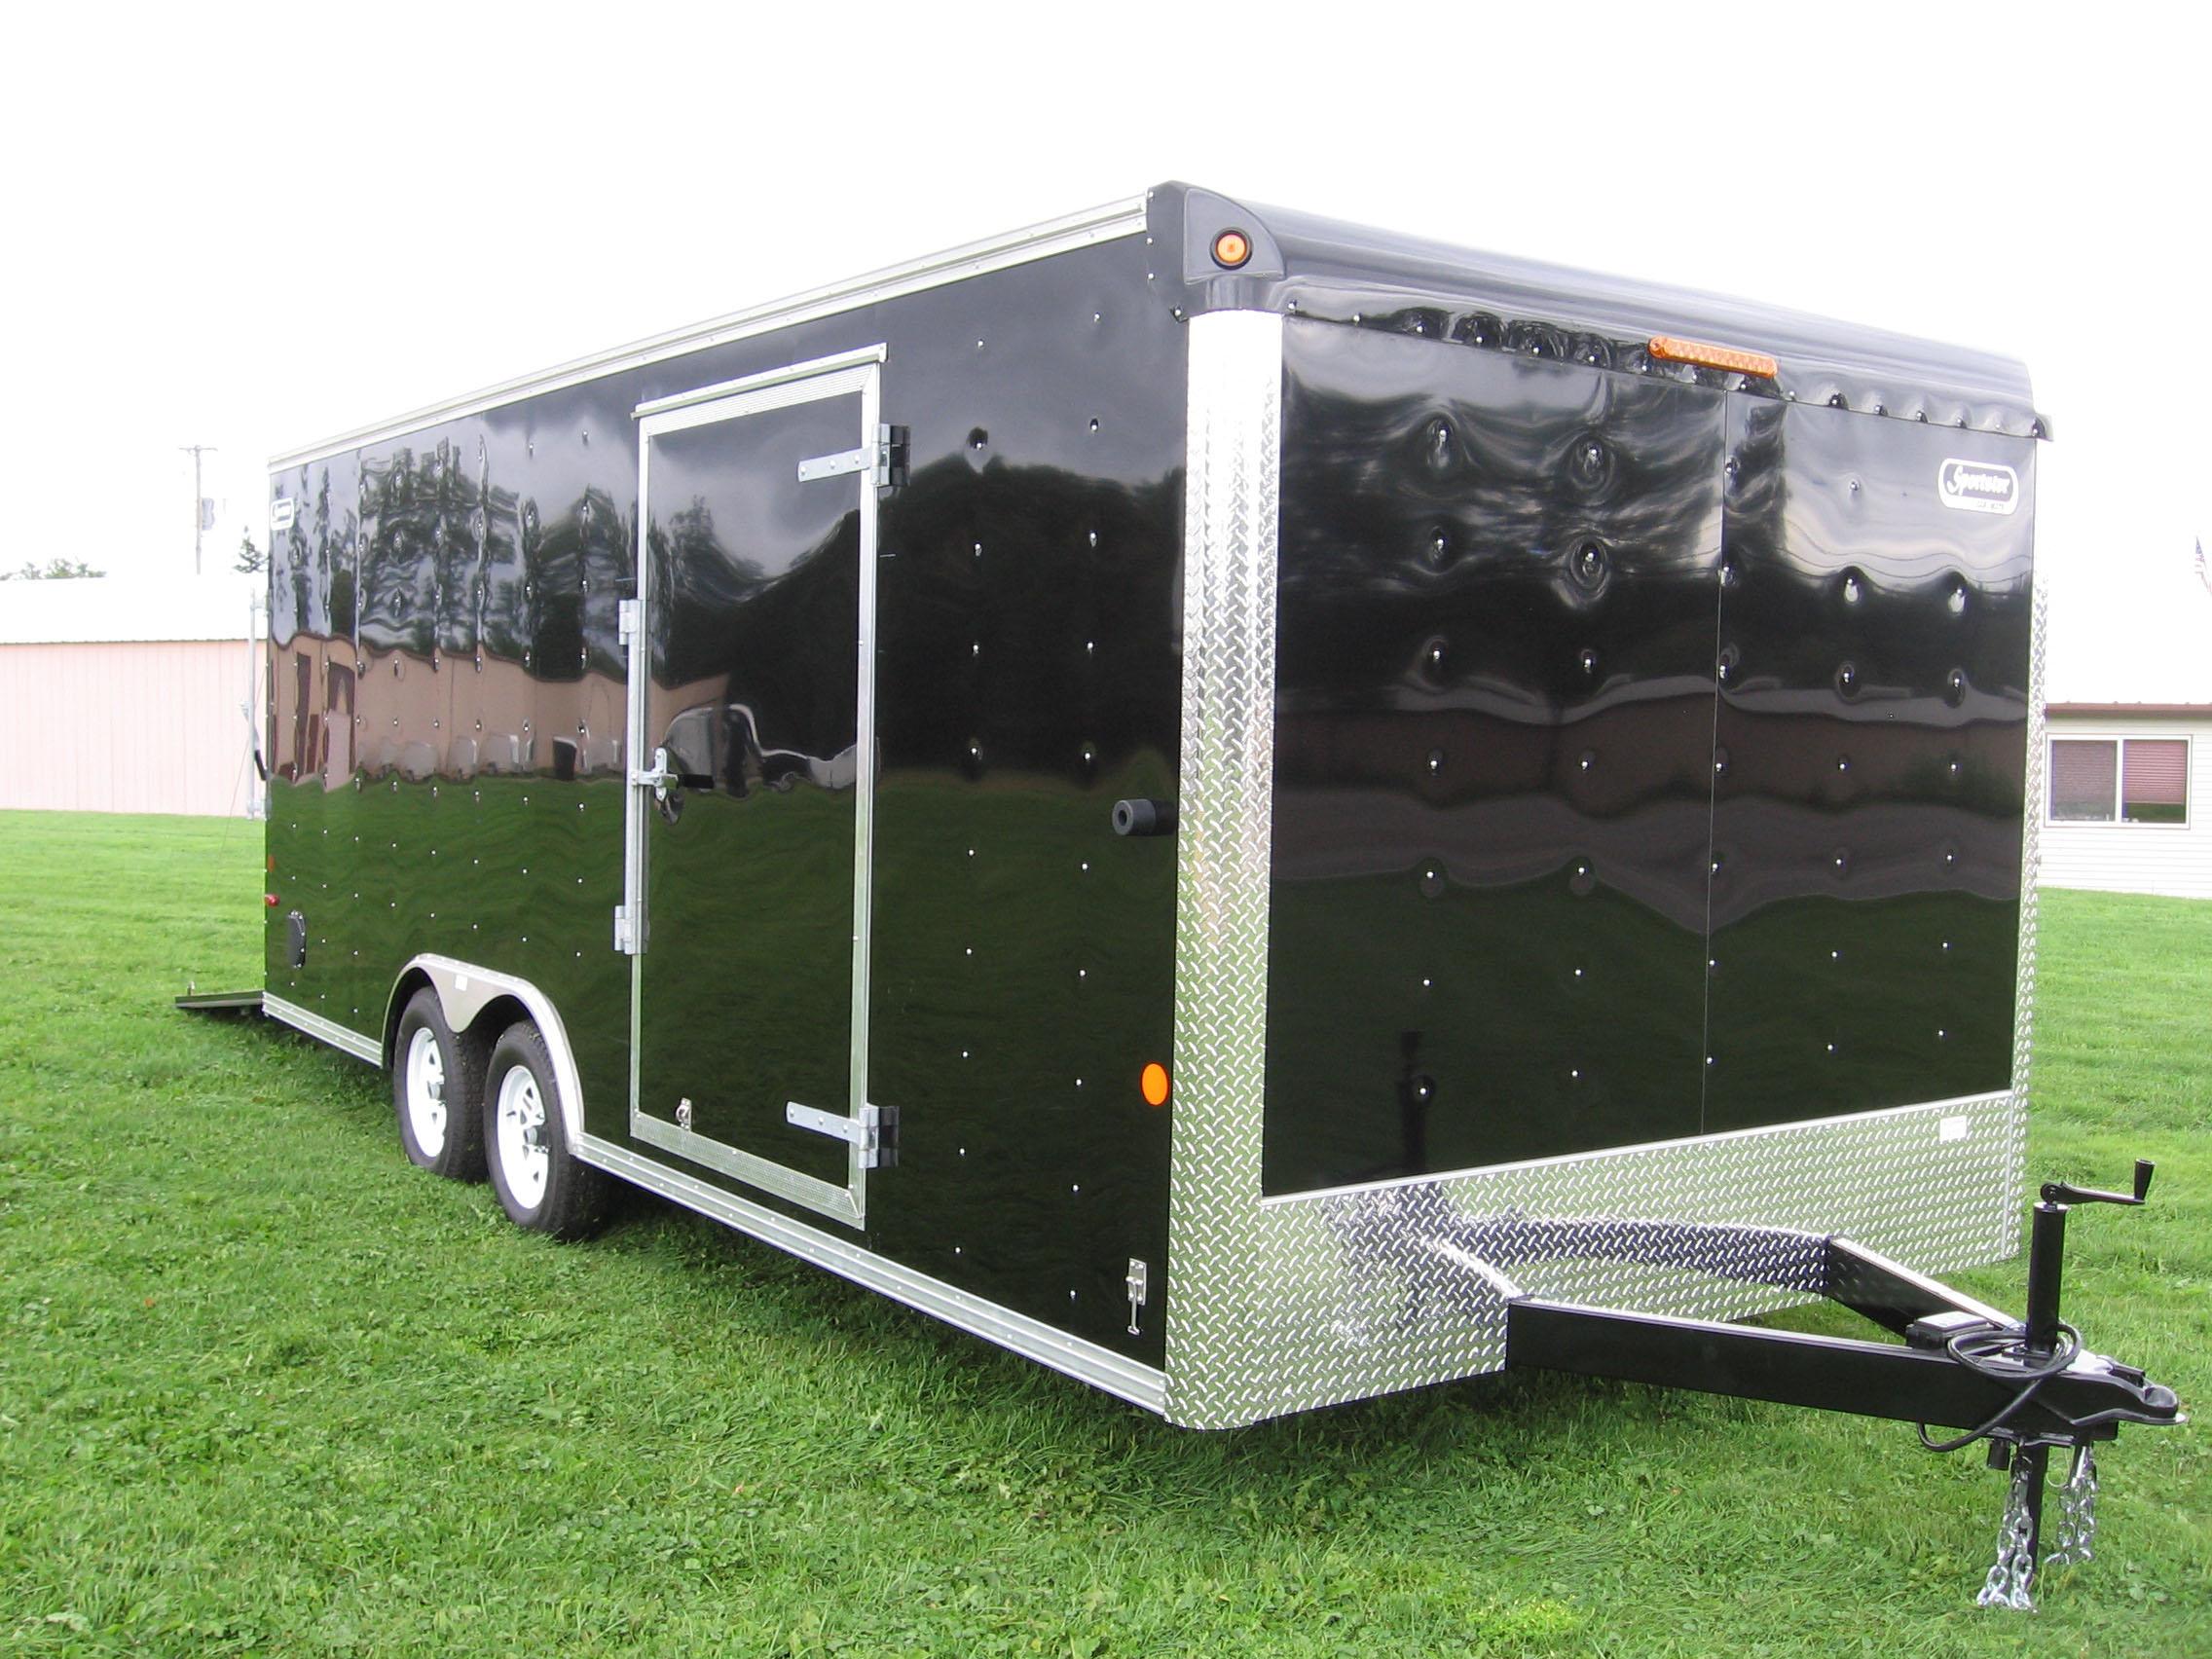 8 5 X 24 Hd Sport Sportster Enclosed Car Hauler Trailer By Car